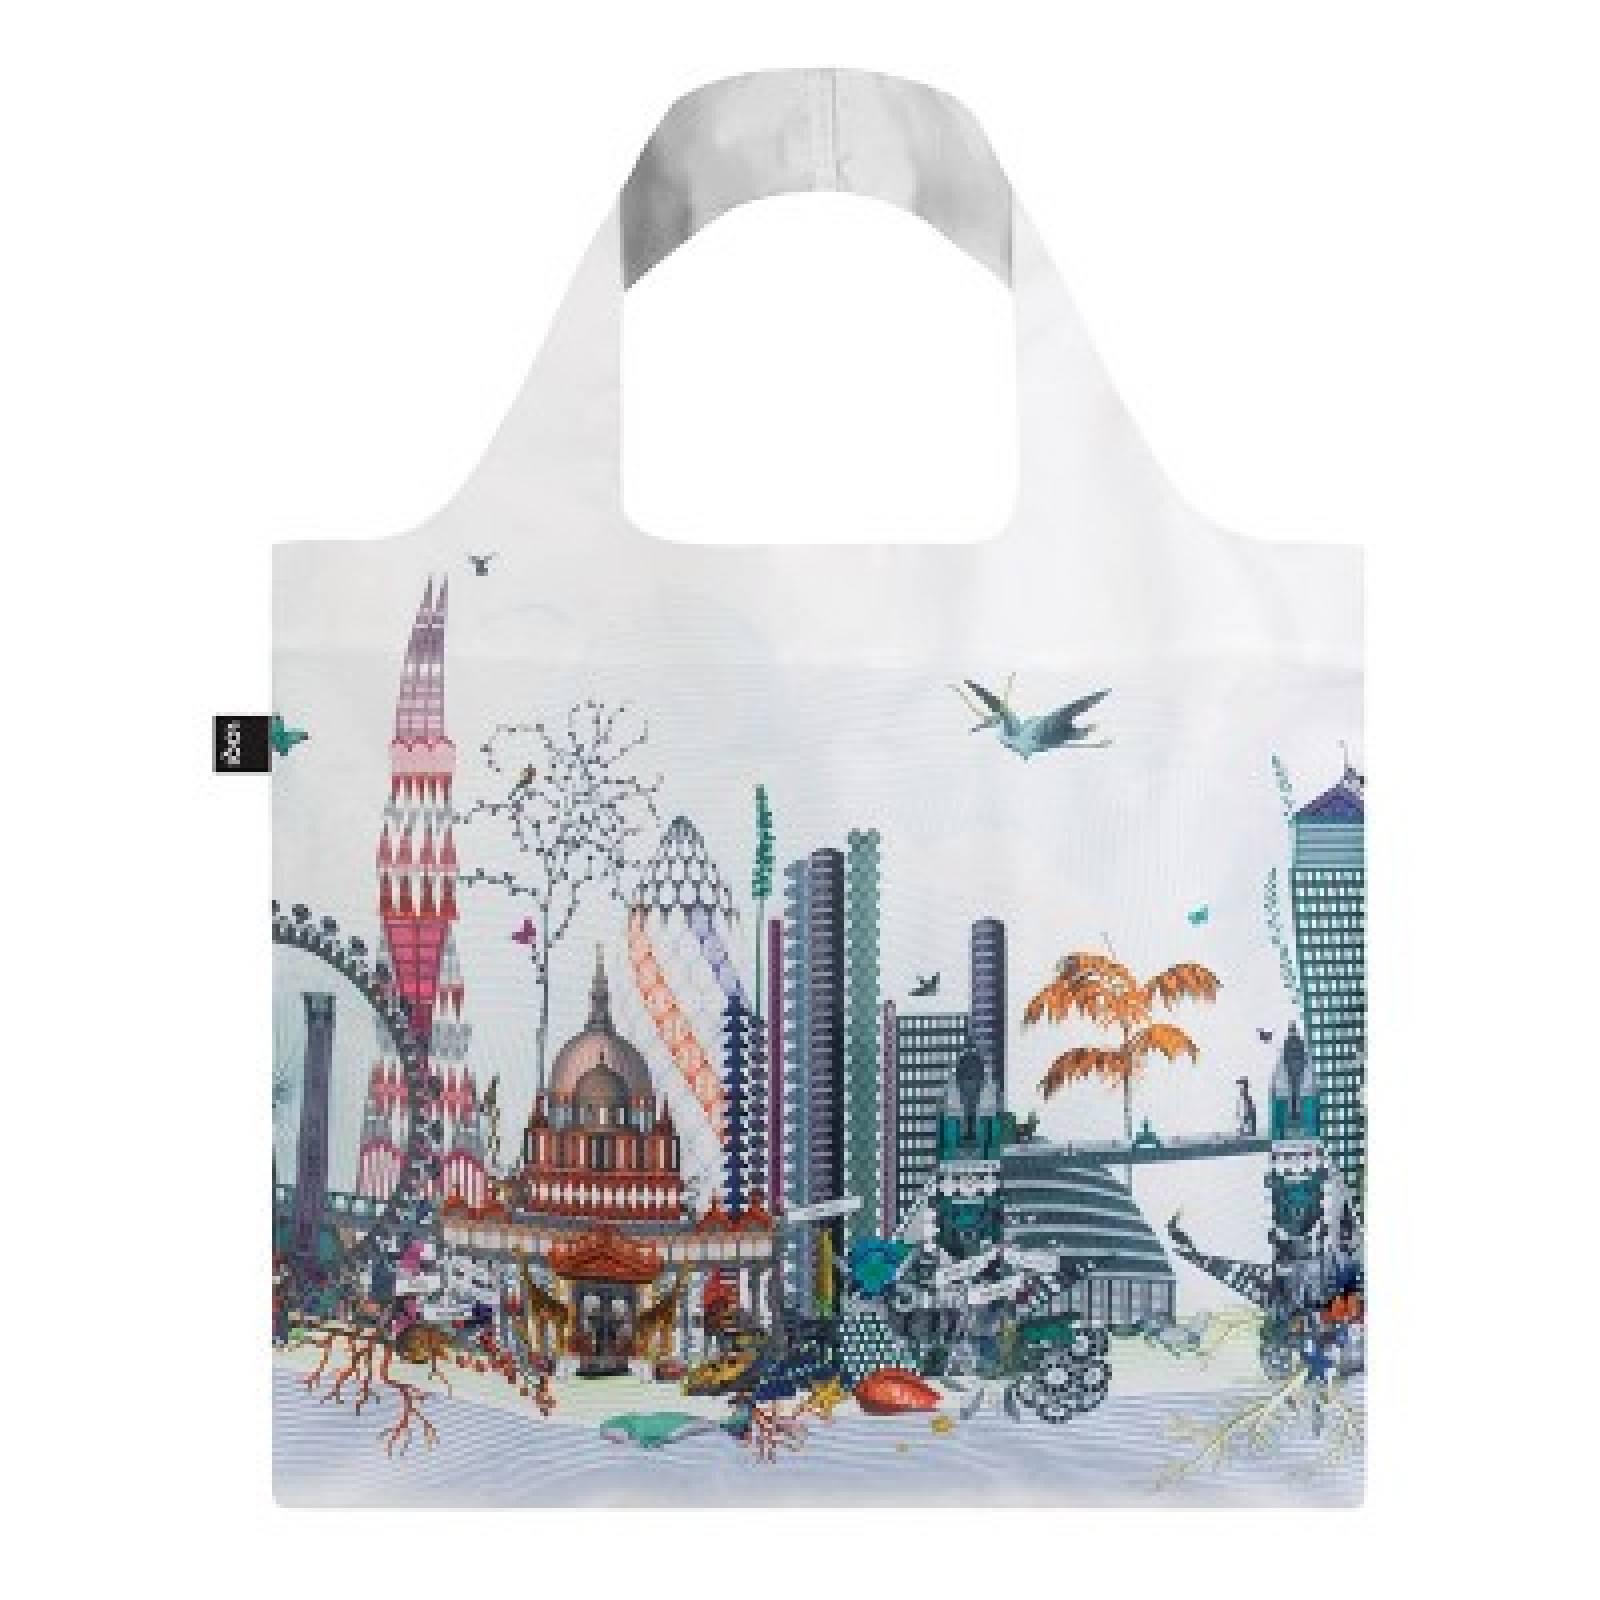 KRISTJANA S WILLIAMS London - Reusable Tote Bag With Pouch